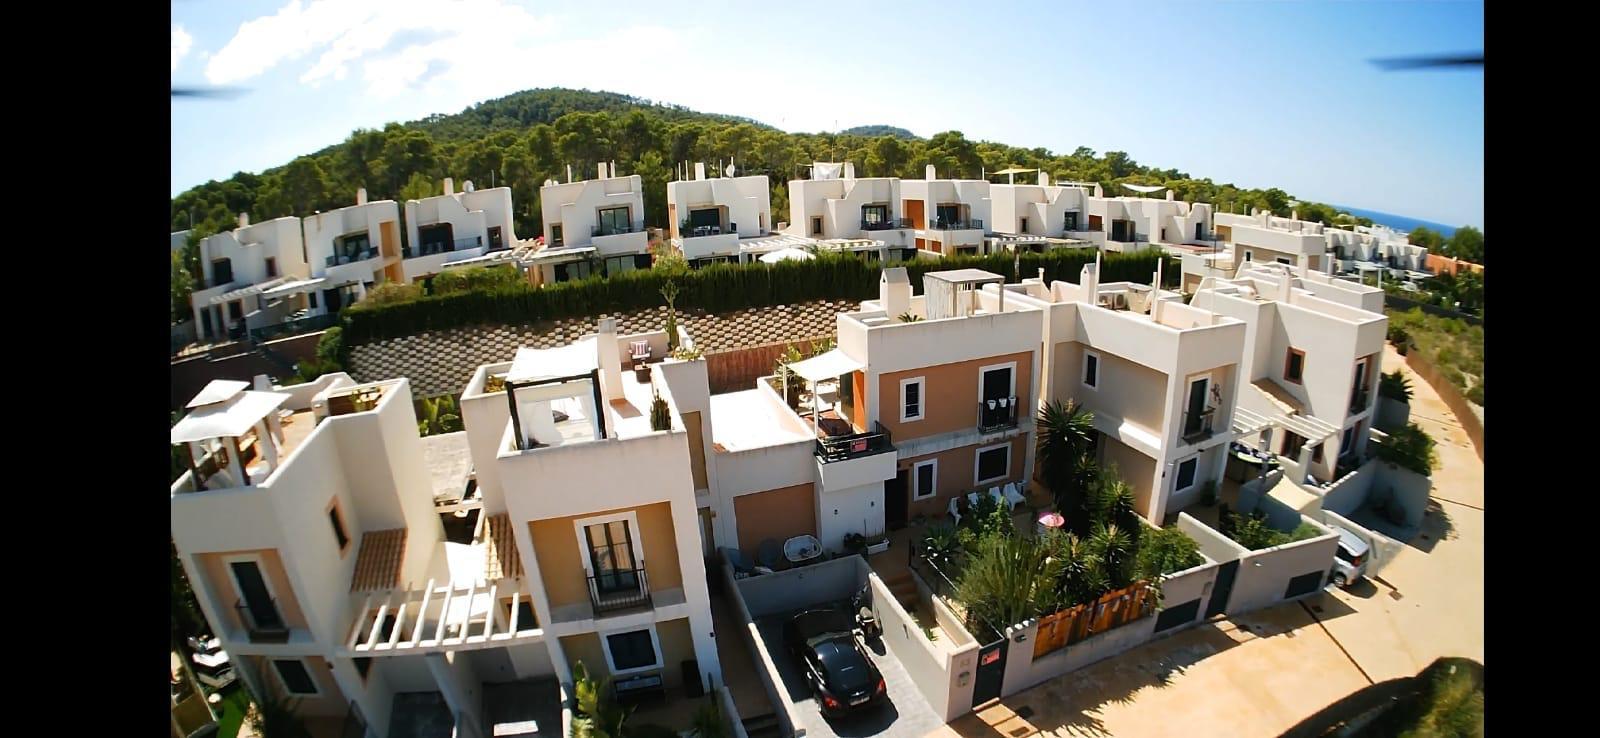 House for sale in Ibiza  walking distance to Cala Tarida beach